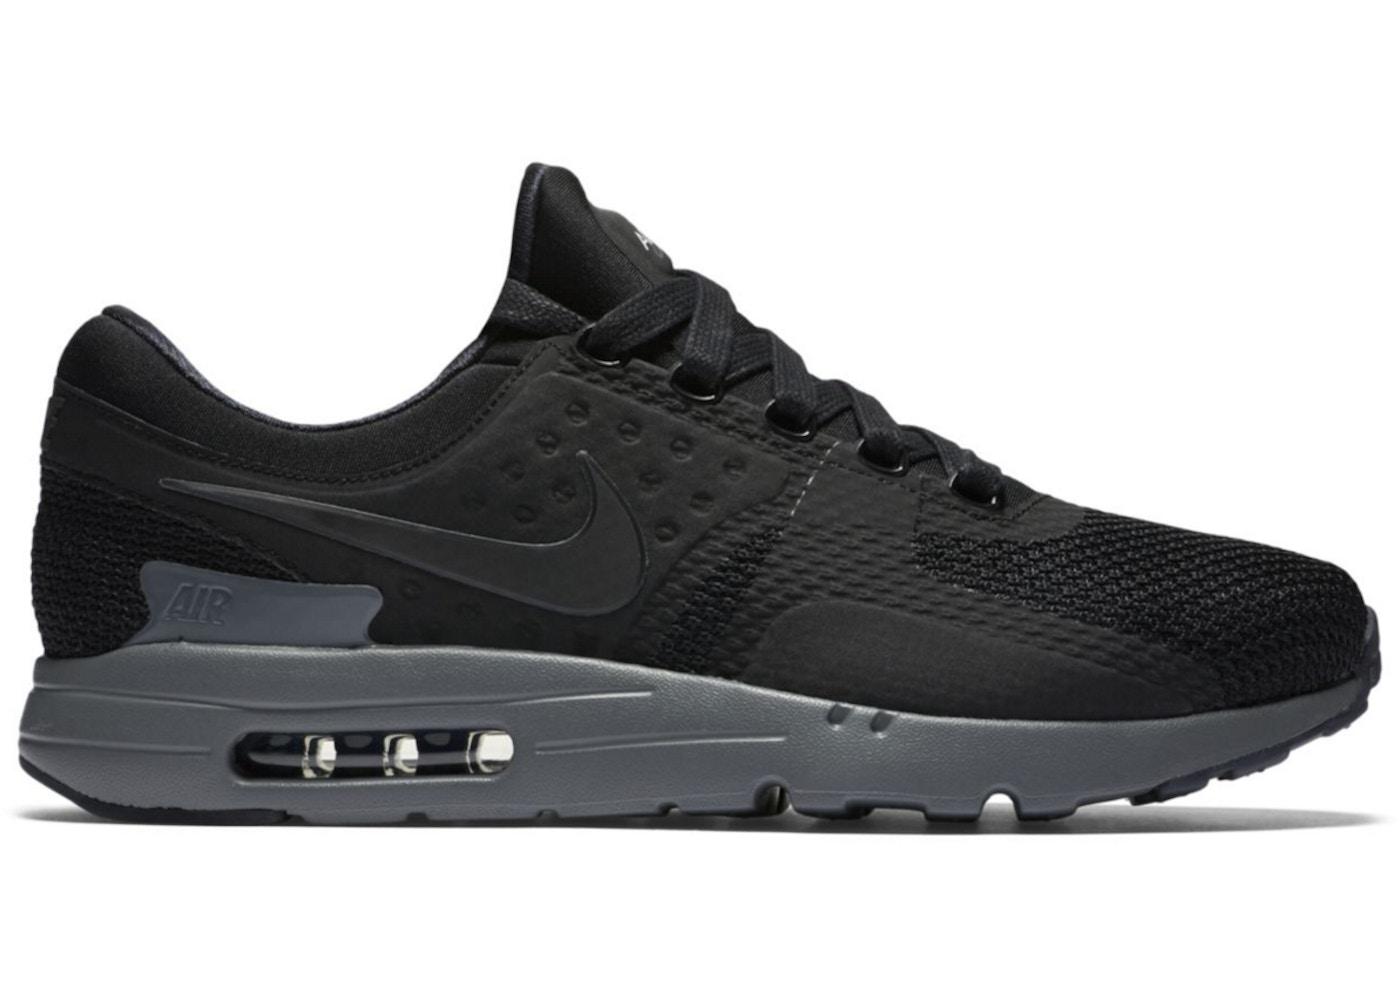 Air Max Zero Nike Air Max Zero Black Dark Grey - 789695-001